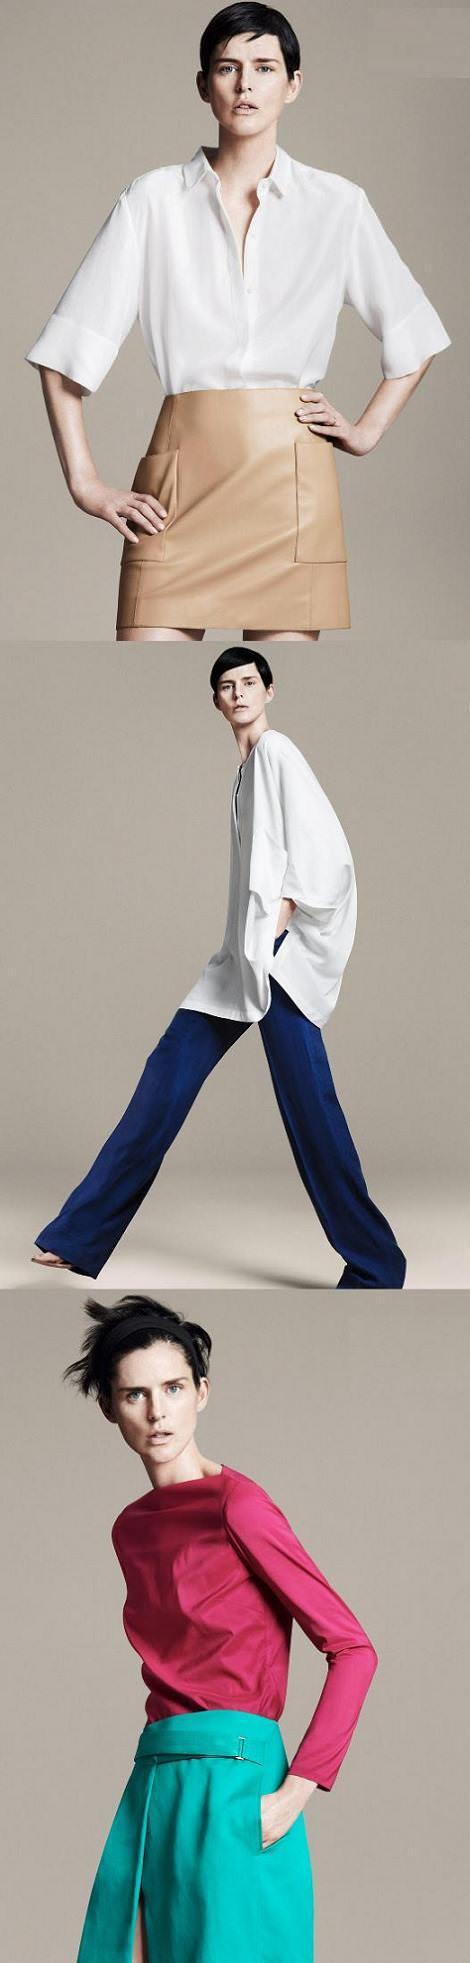 Catálogo Zara primavera verano 2011